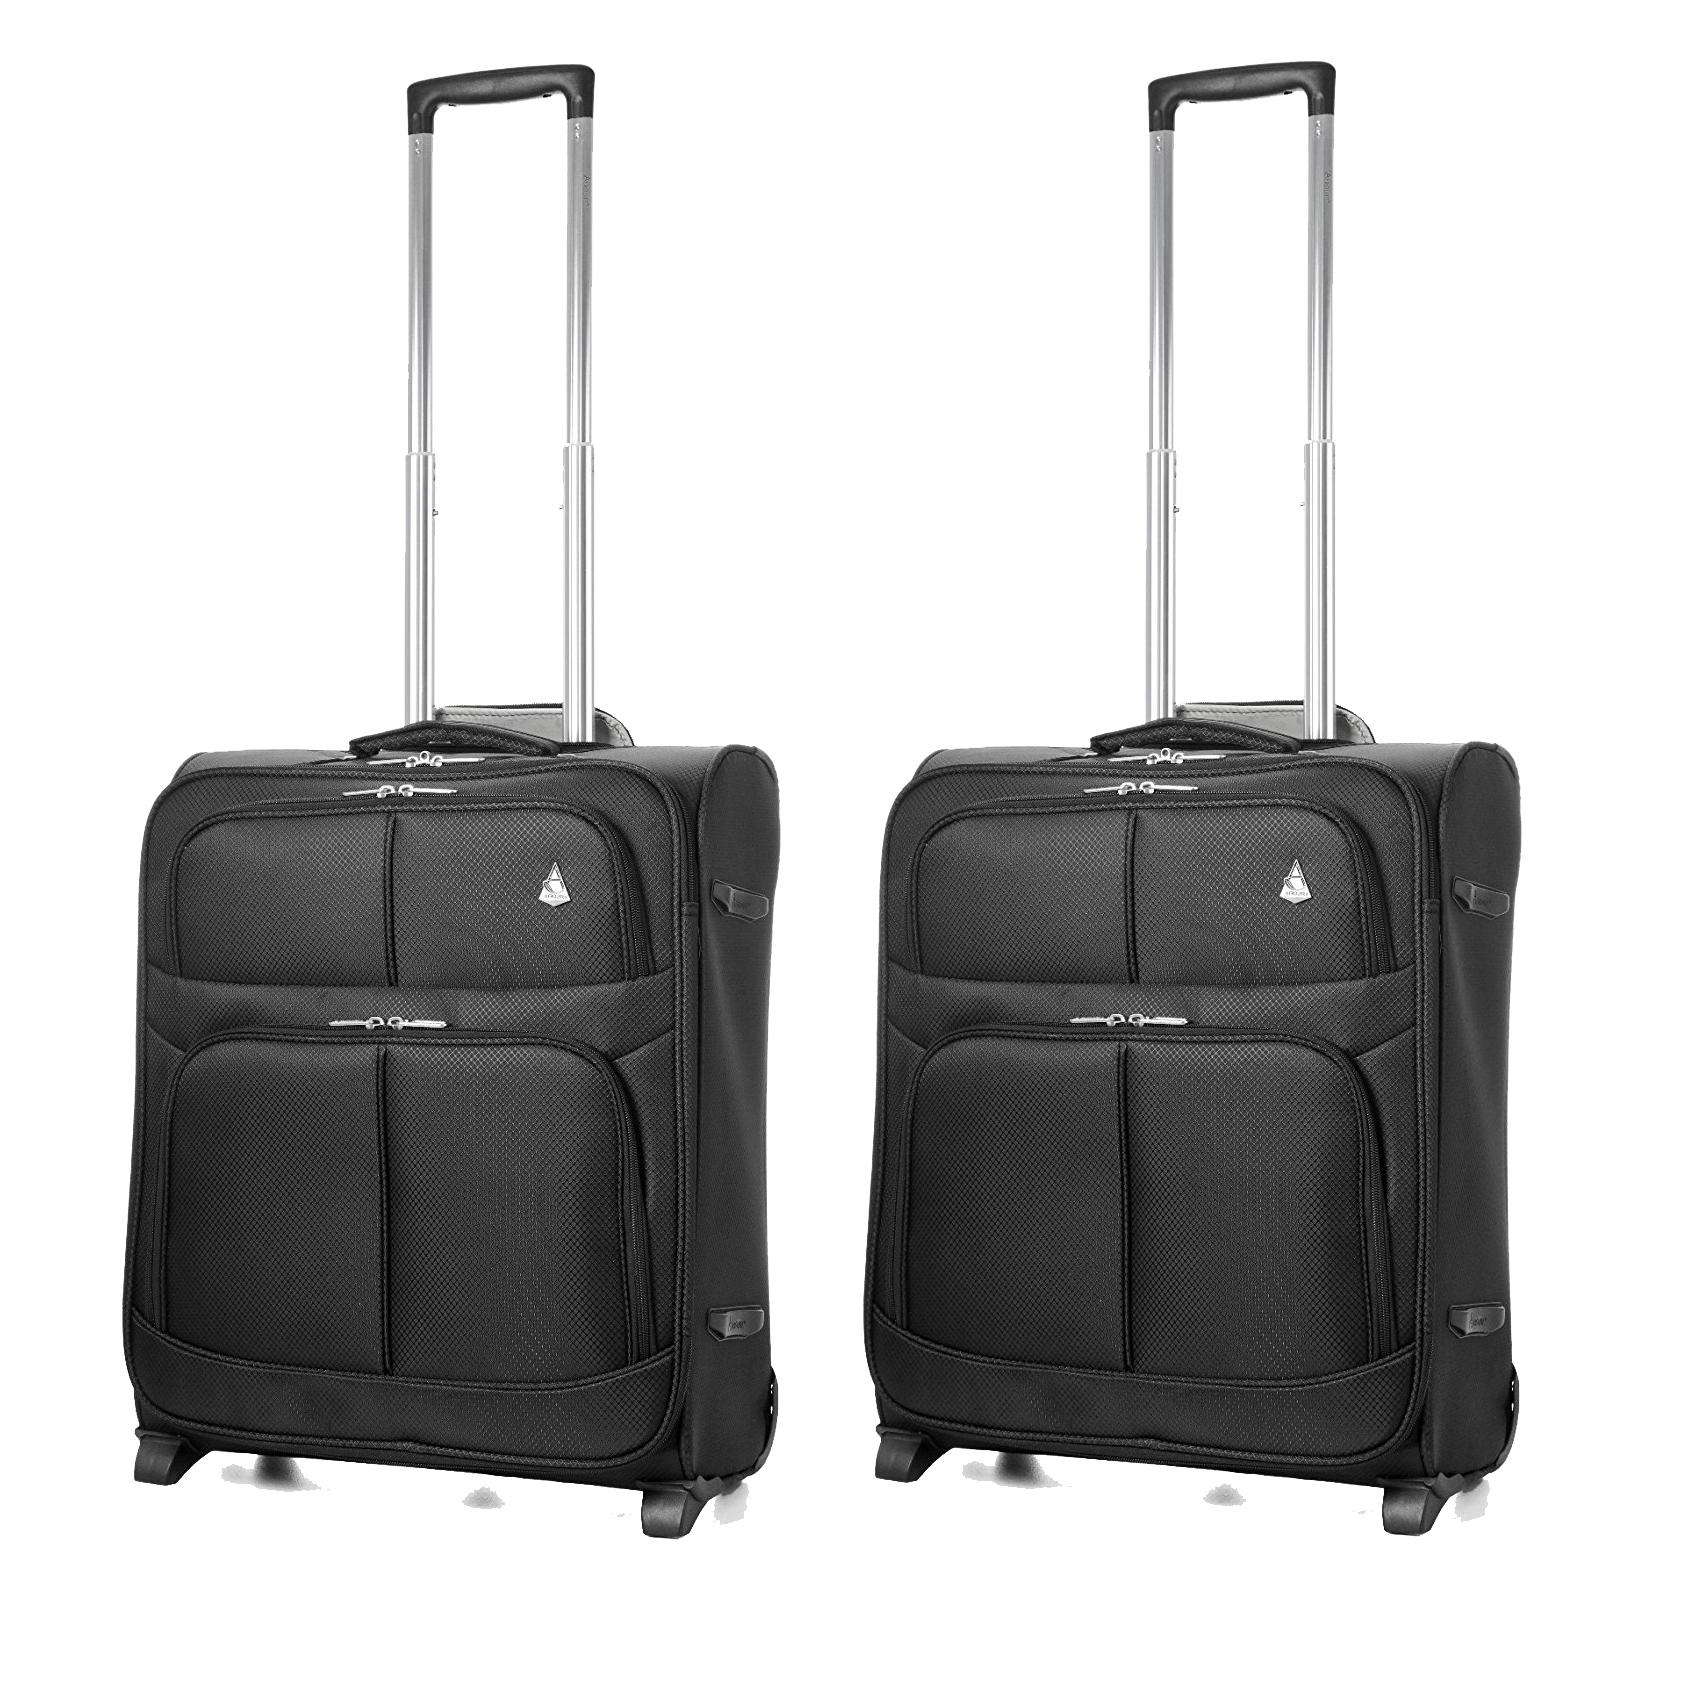 2 x Aerolite Lightweight 2 Wheel Max Cabin Hand Luggage 56 cm 60 Litre